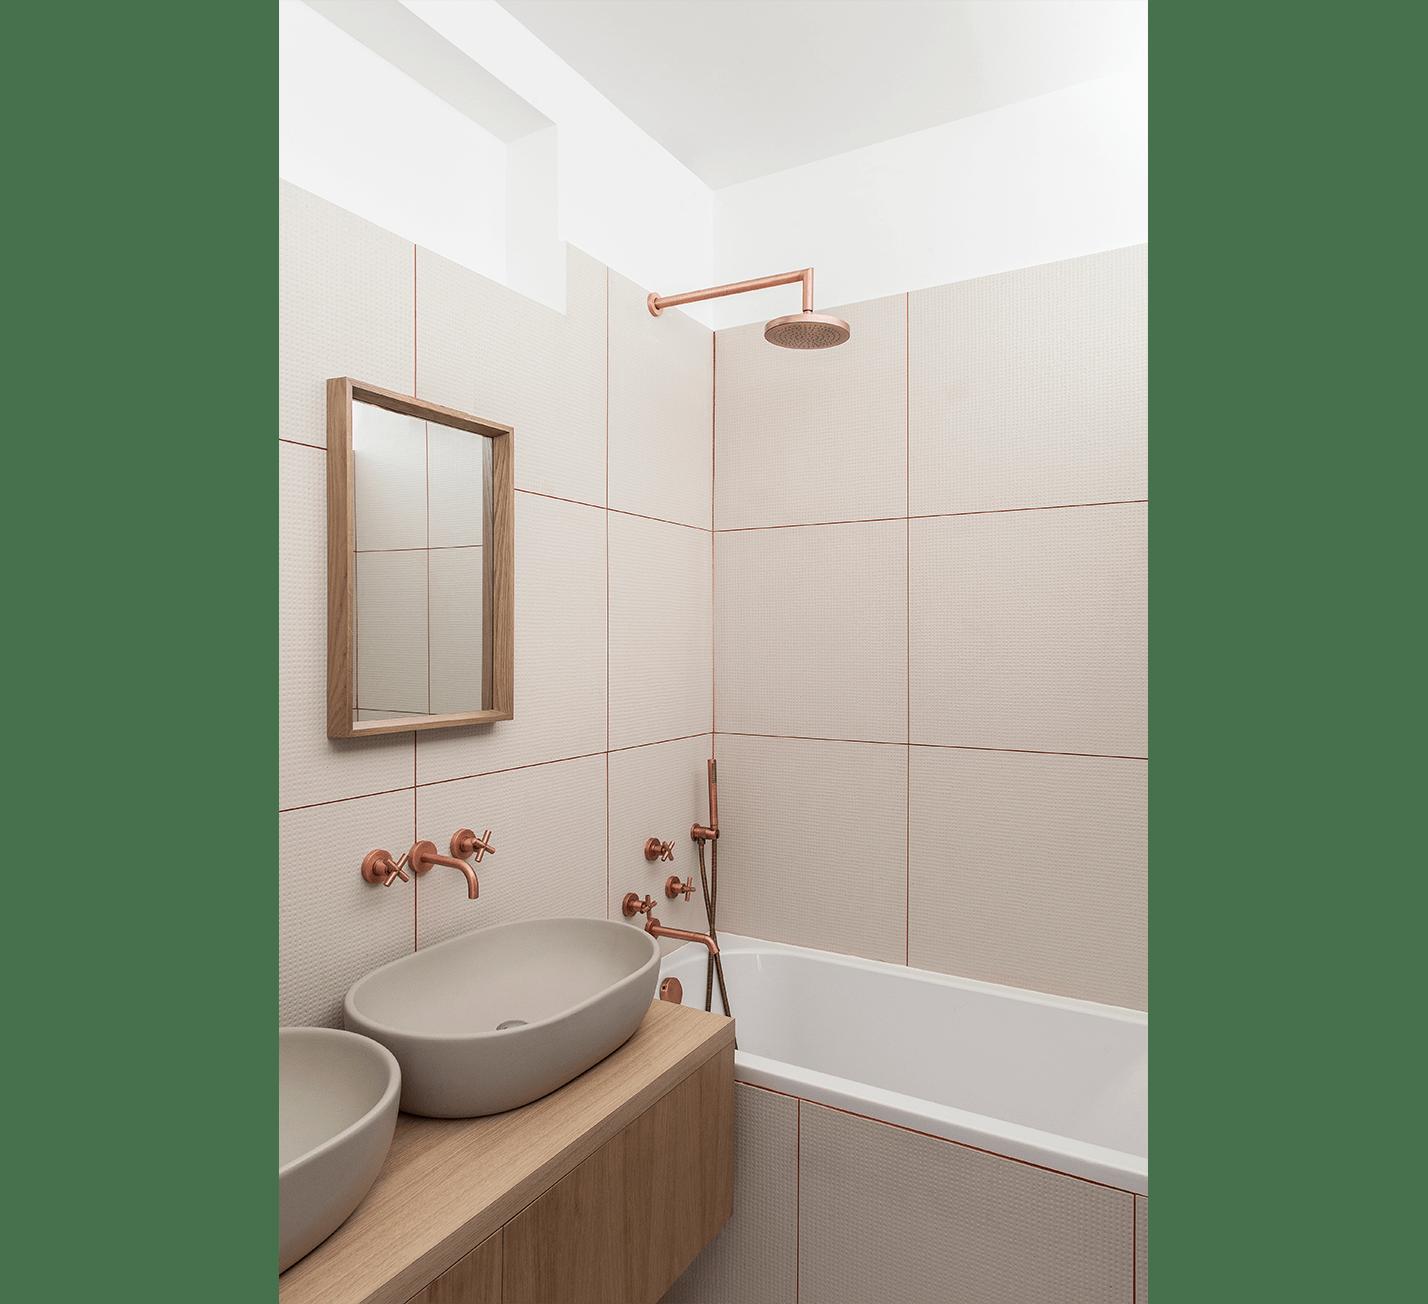 Projet-Alfred-Atelier-Steve-Pauline-Borgia-Architecture-interieur-08-min